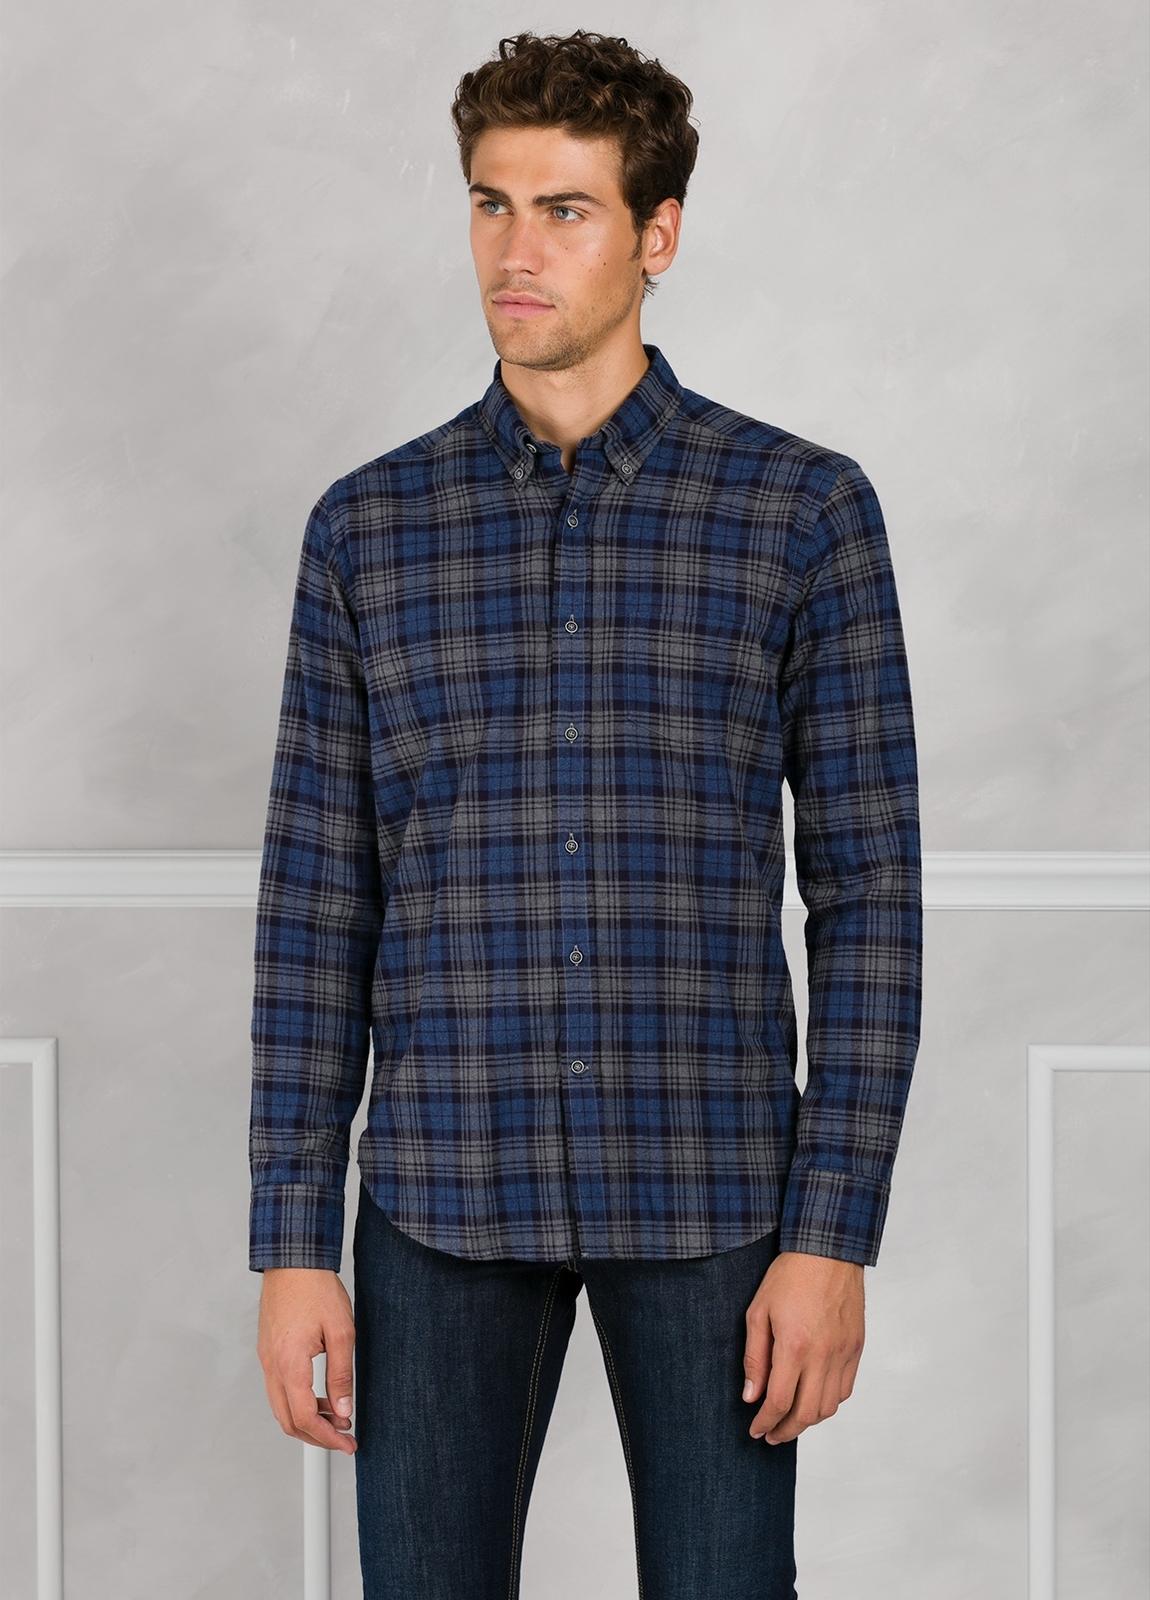 Camisa Leisure Wear REGULAR FIT Modelo BOTTON DOWN cuadros color azul marino. 100% Algodón.